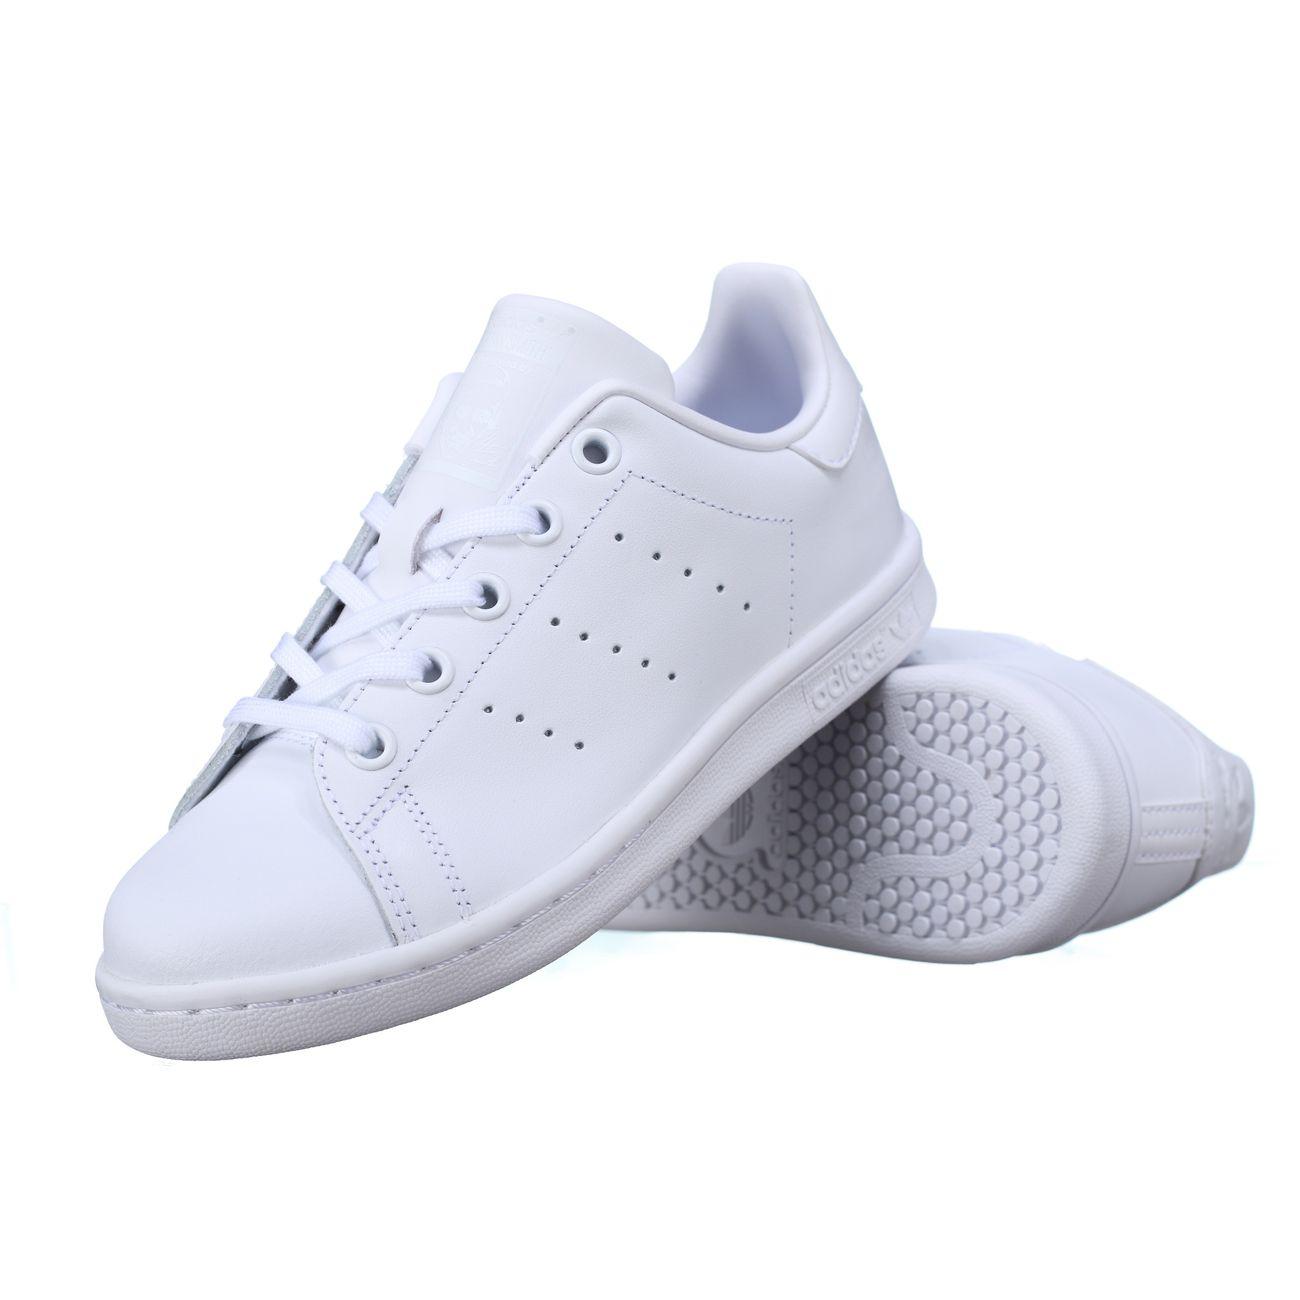 Mode- Lifestyle garçon ADIDAS Basket enfant Adidas Stan Smith C Bb8388 Full Blanc